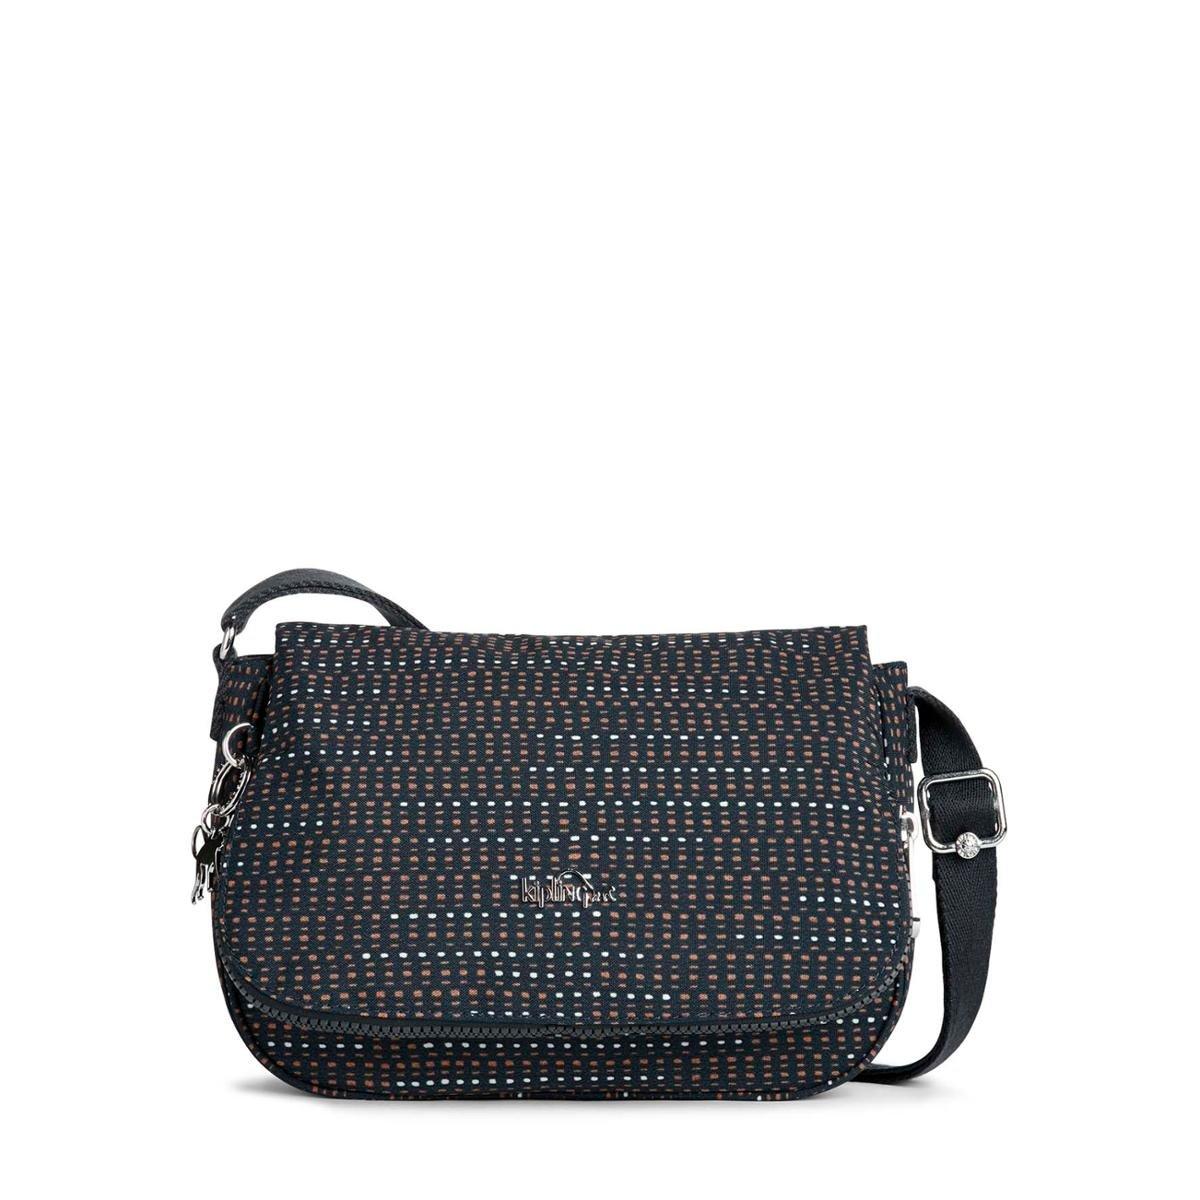 7ae66474c Bolsa Kipling Mini Bag Earthbeat Feminina | Livelo -Sua Vida com ...